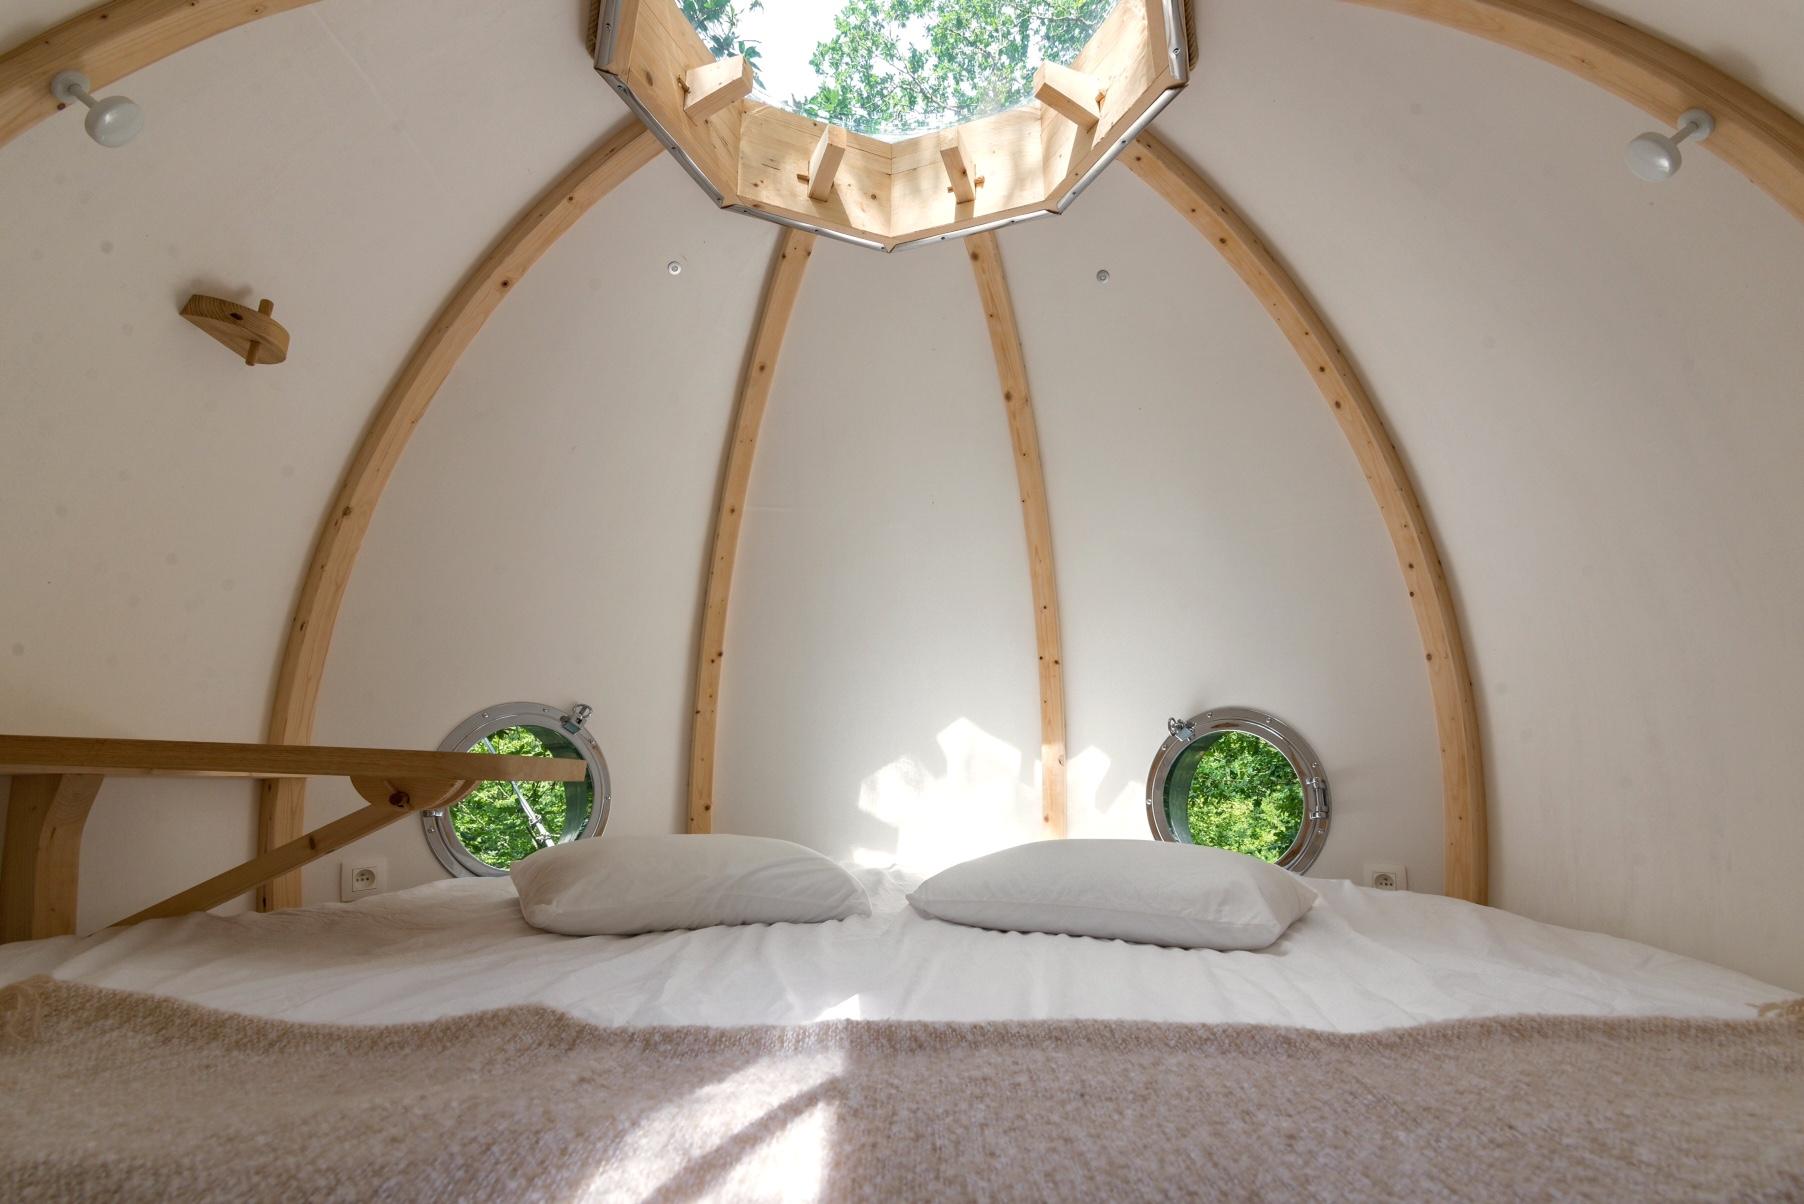 la cabane spa cocoon plume le bois de rosoy. Black Bedroom Furniture Sets. Home Design Ideas